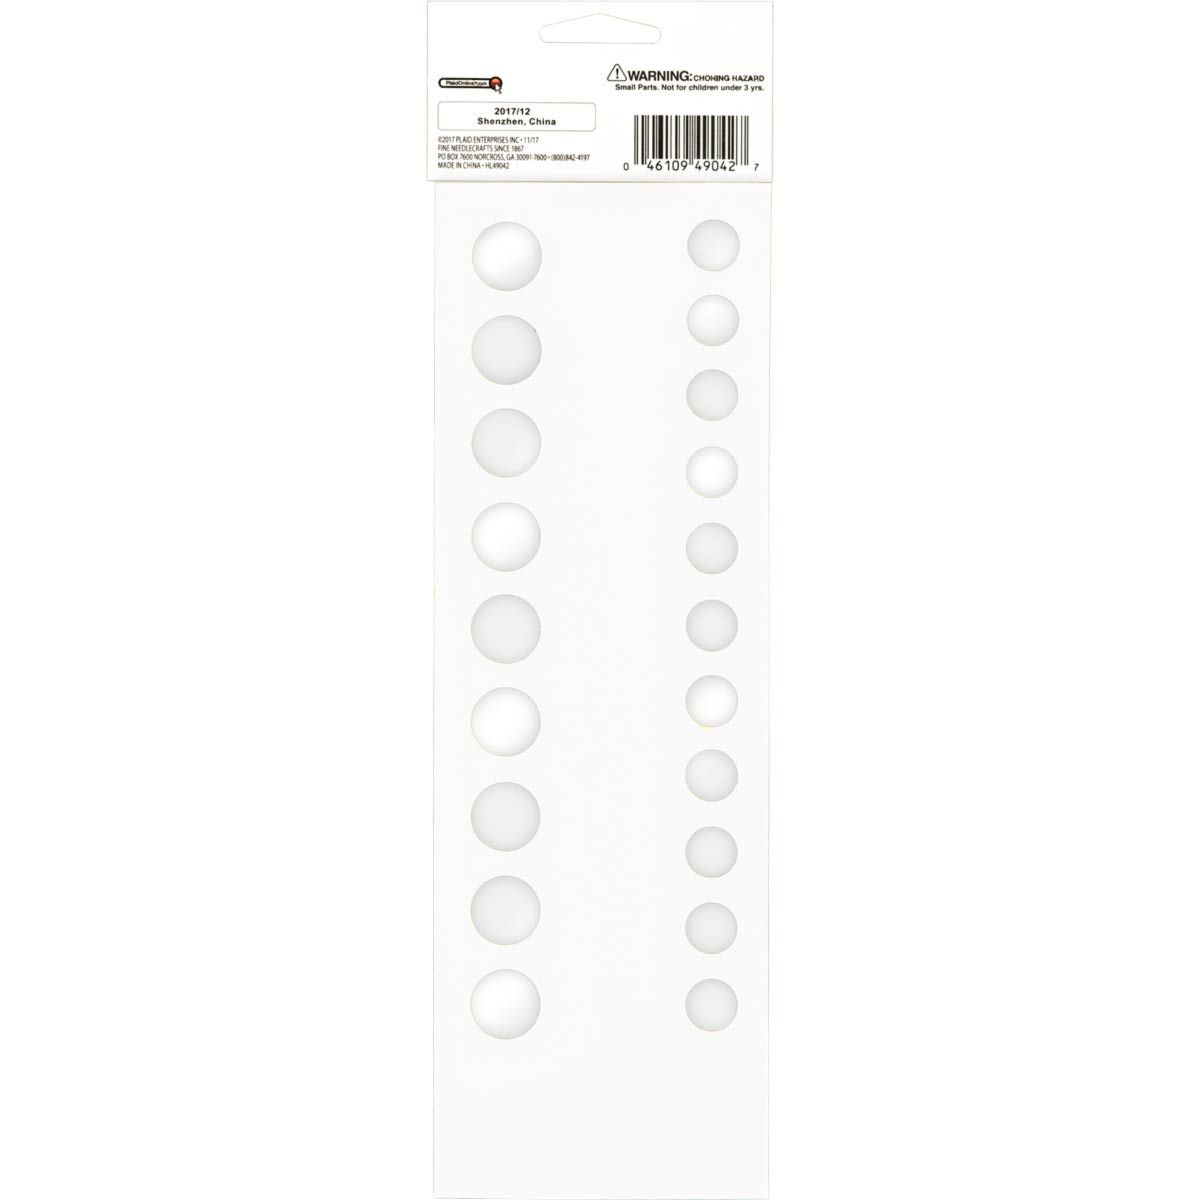 Bucilla ® Floss Separator - Large, 3 piece